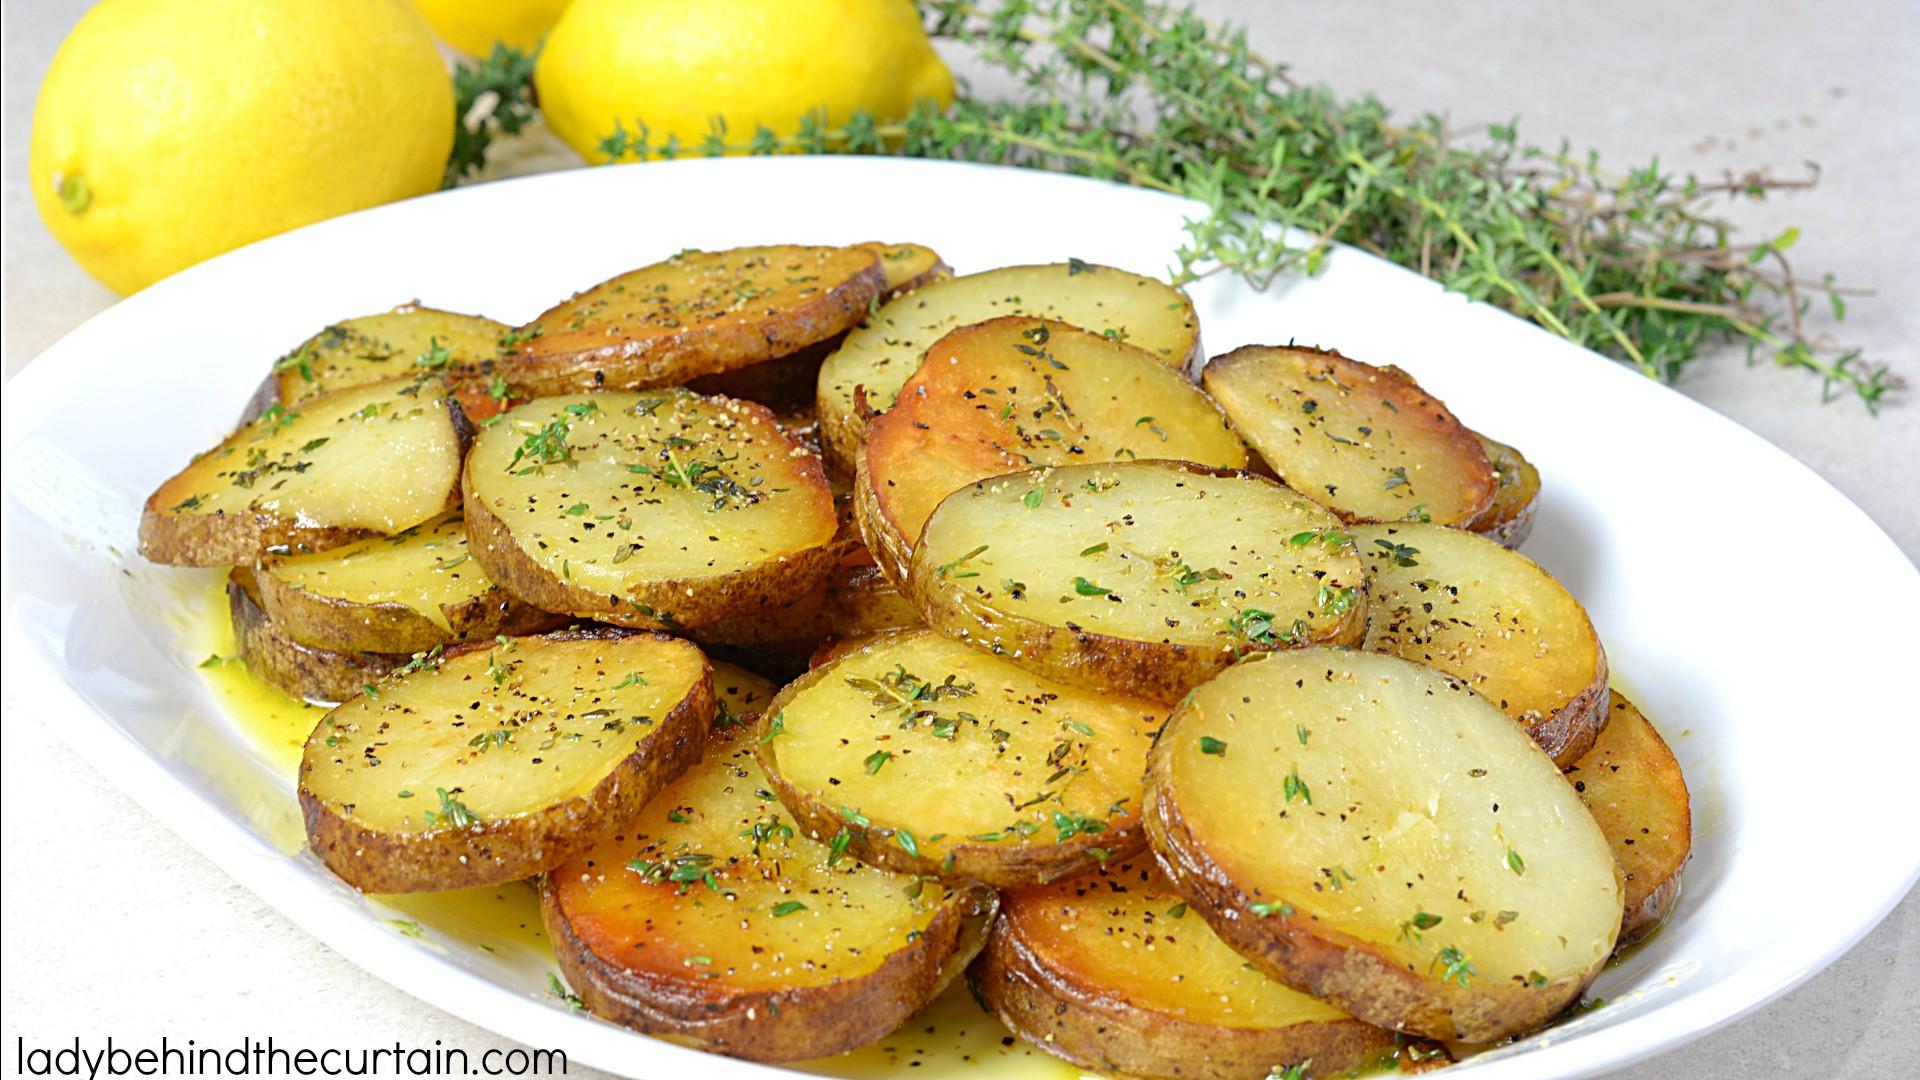 Leftover Baked Potato Recipes  Lemony Leftover Baked Potatoes